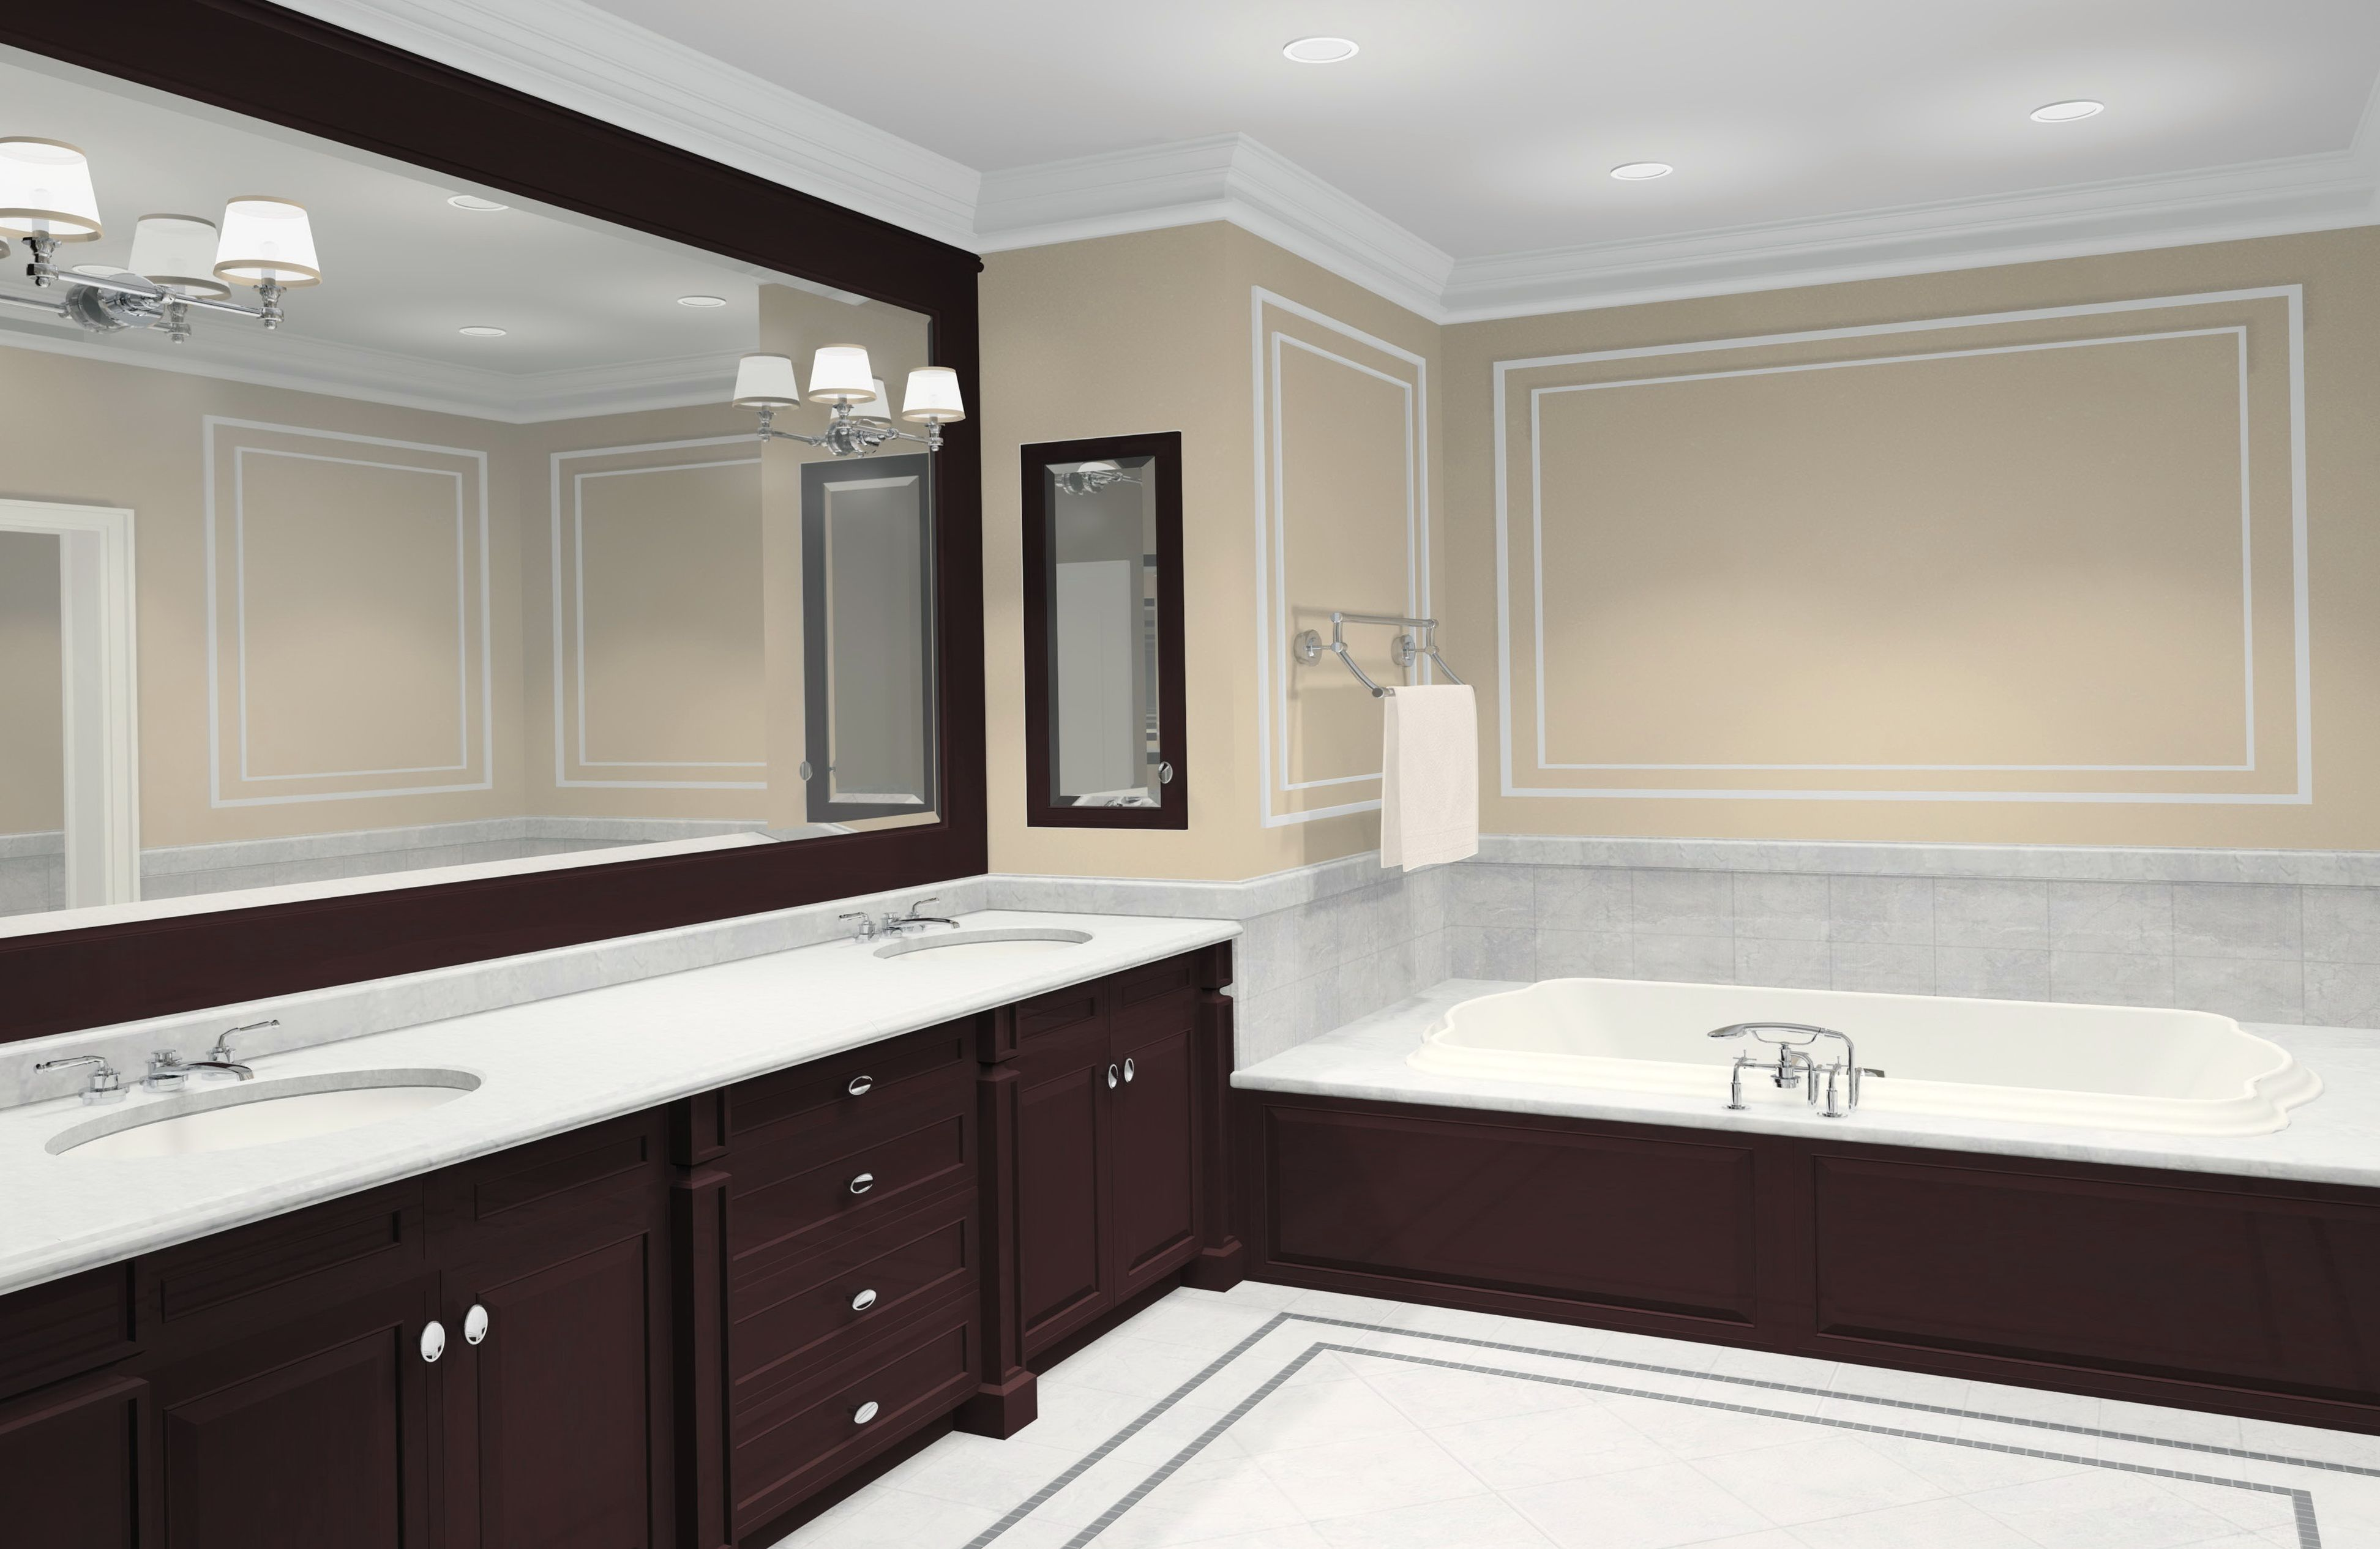 Elegant Big Bathroom Mirror Ideas Home And Interior Design